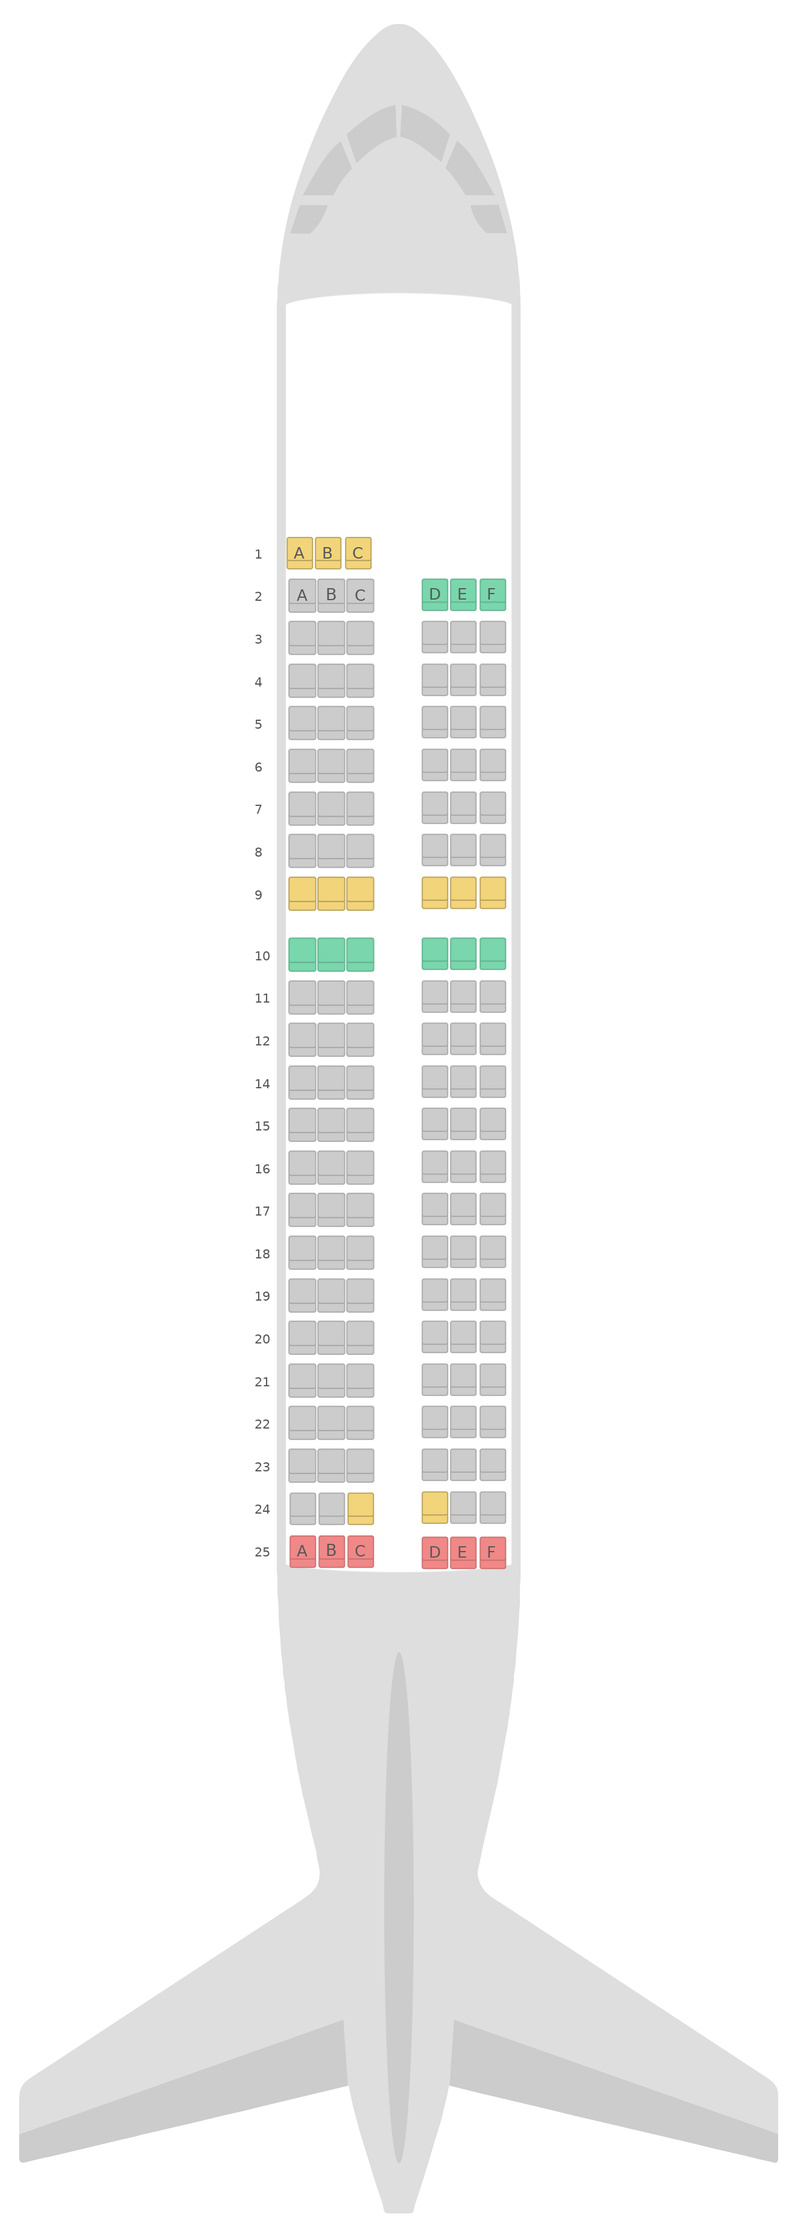 Mapa de asientos Airbus A319 Scandinavian Airlines (SAS)